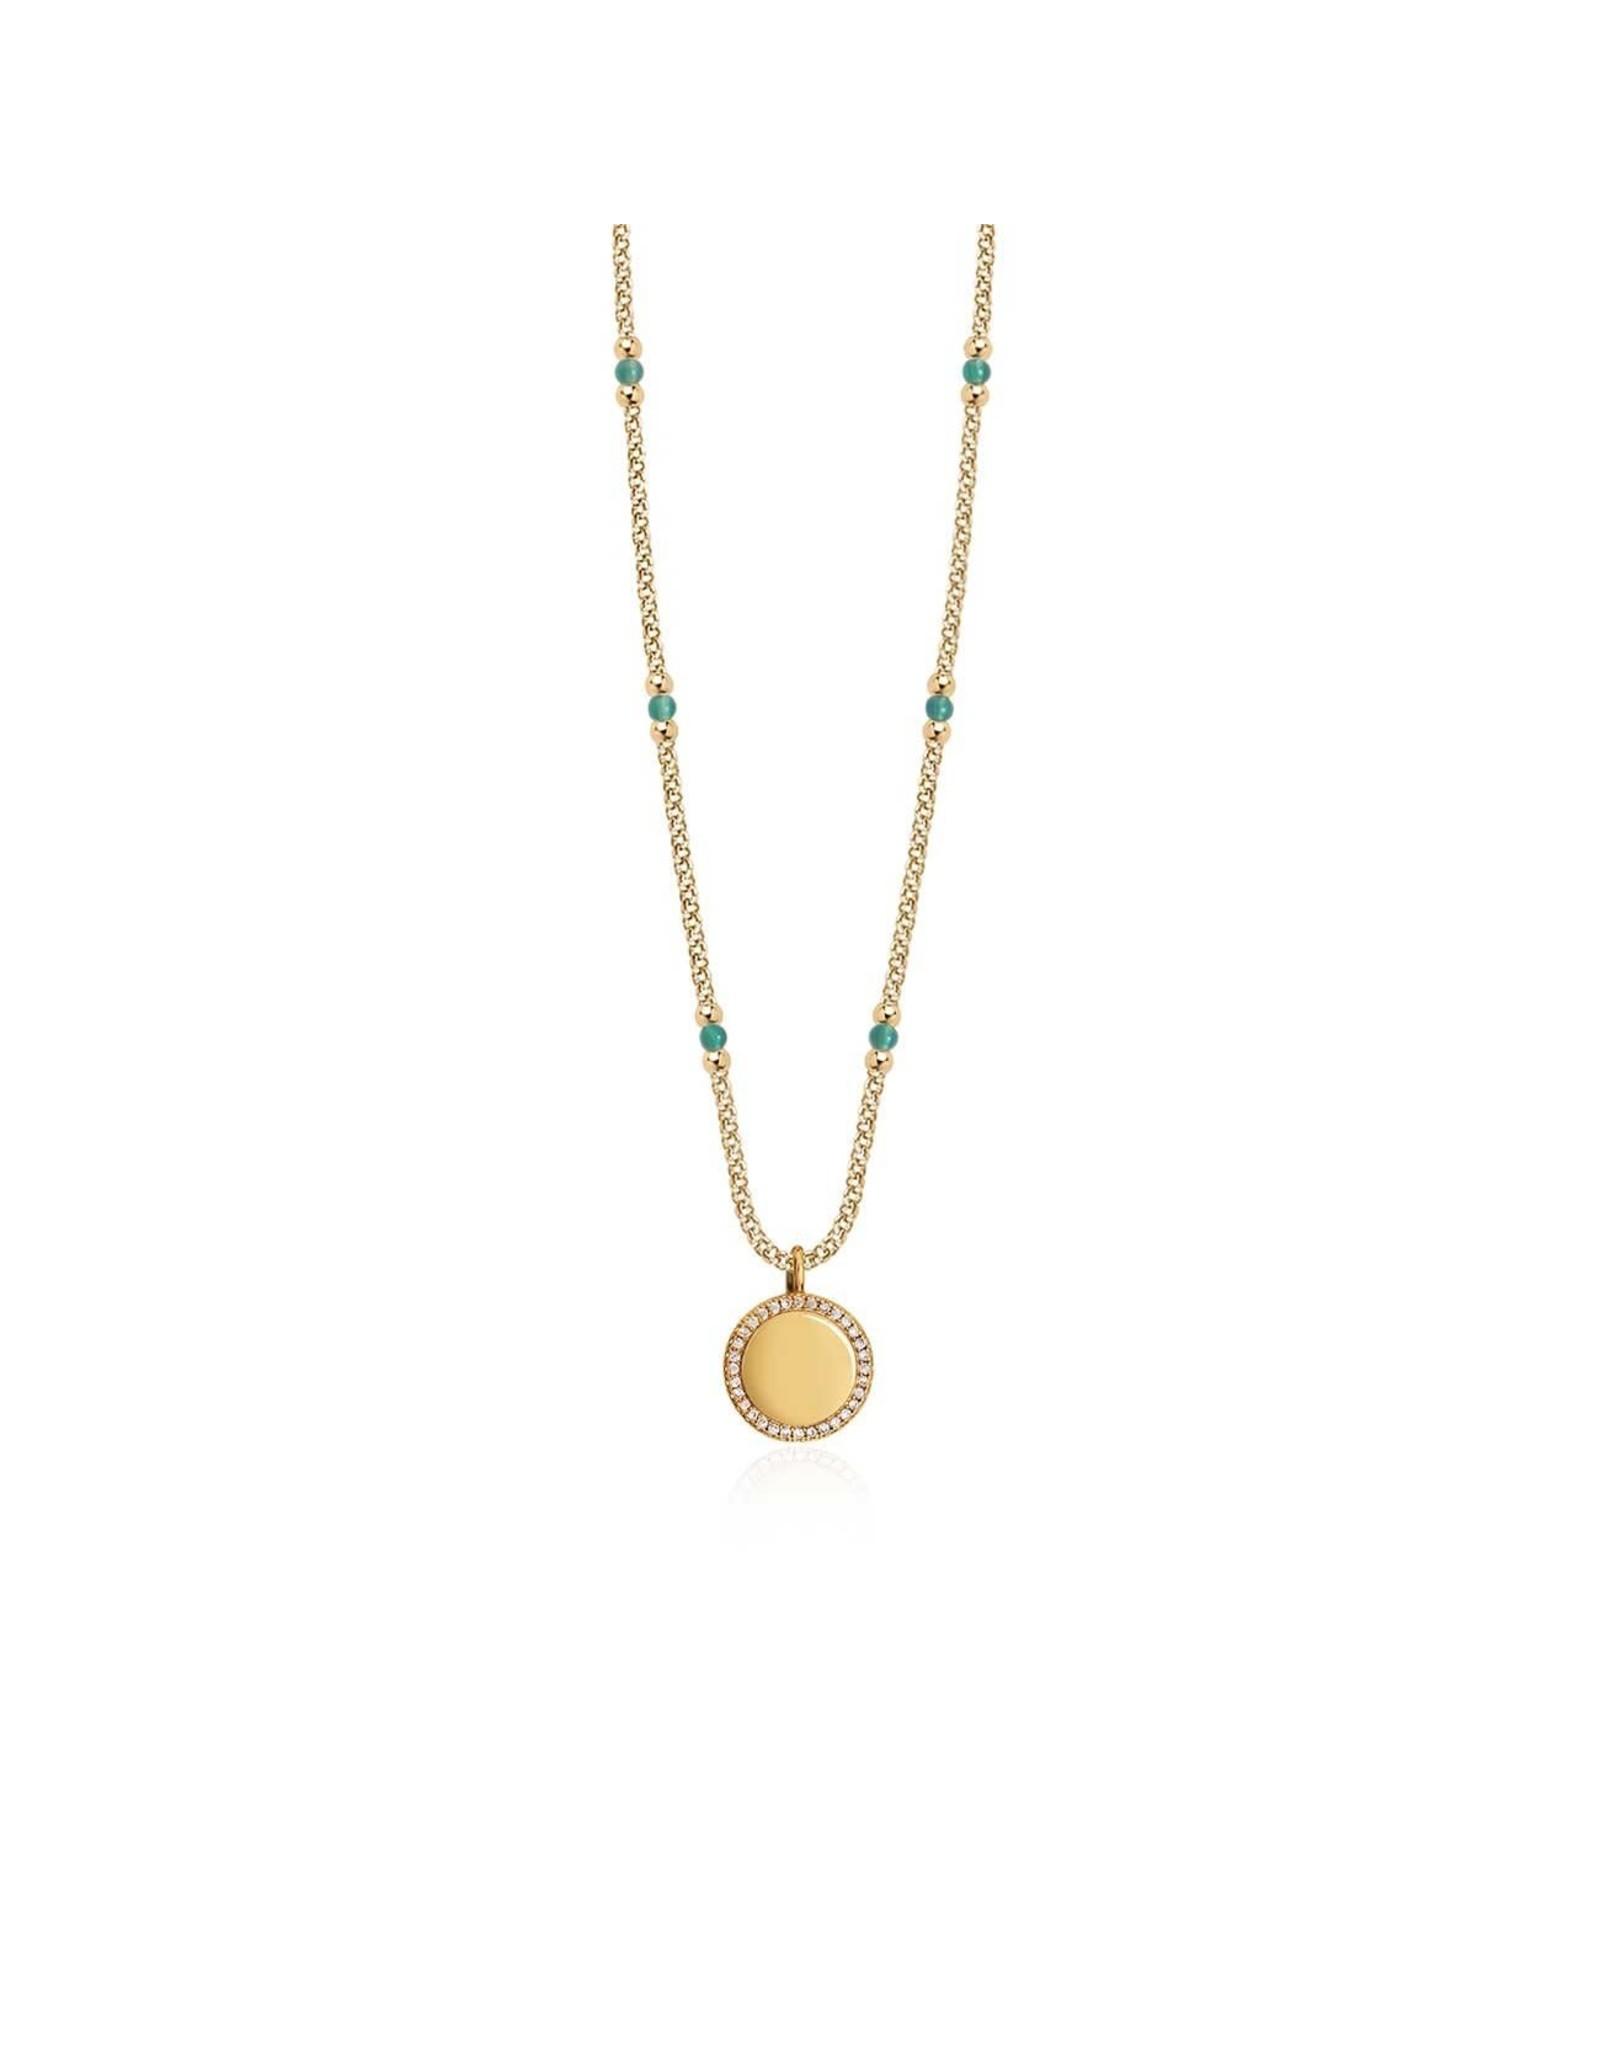 Joma Jewellery Wellness Gems - Aventurine - Ketting